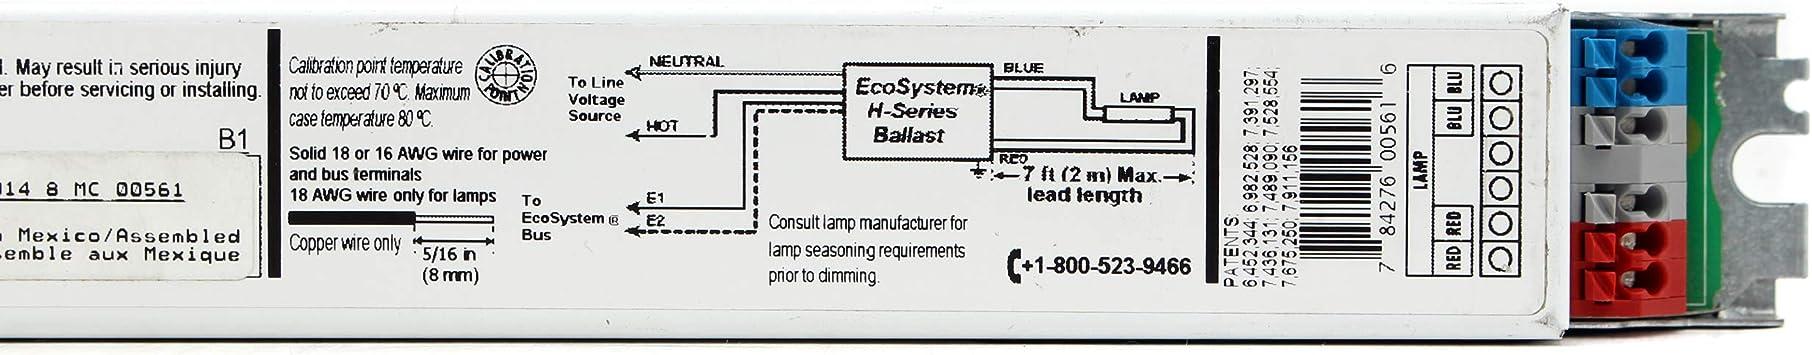 25W T8 Lutron EHDT825MU110 Fluorescent Dimming Ballast 1-Lamp F25T8 120//277V